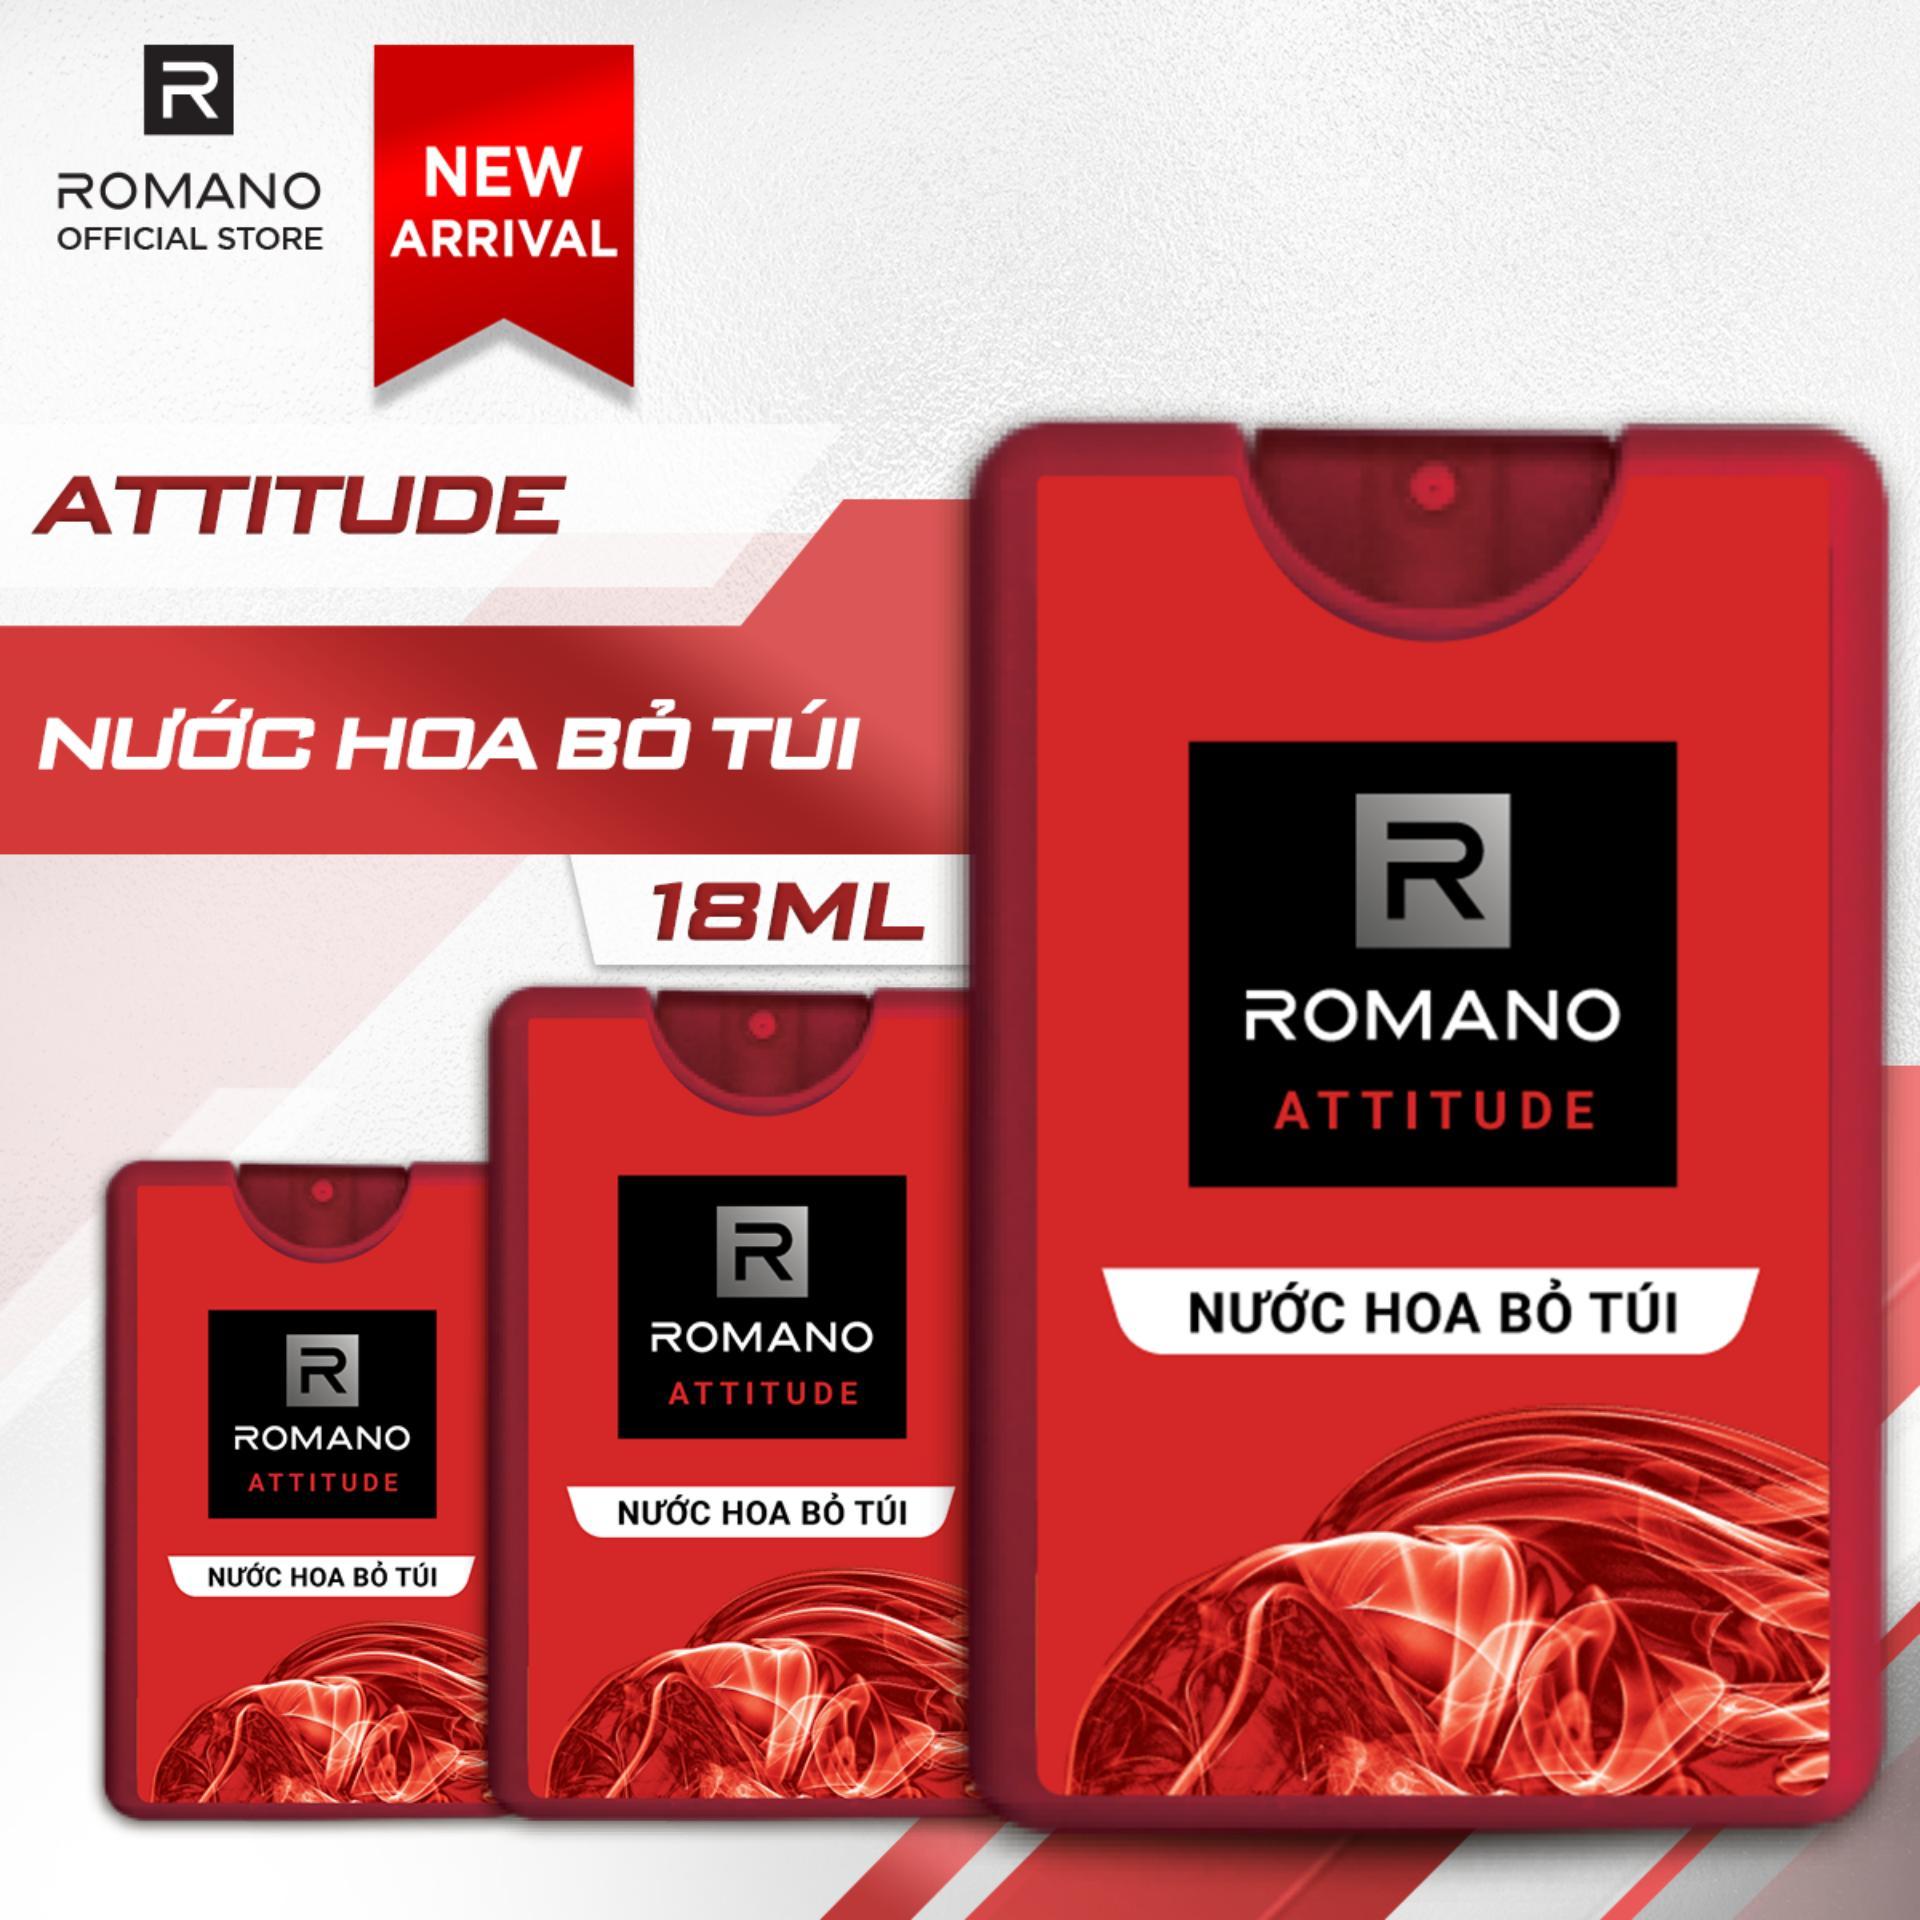 Combo 3 Nước hoa bỏ túi Romano Attitude nồng ấm quyến rũ 18ml cao cấp